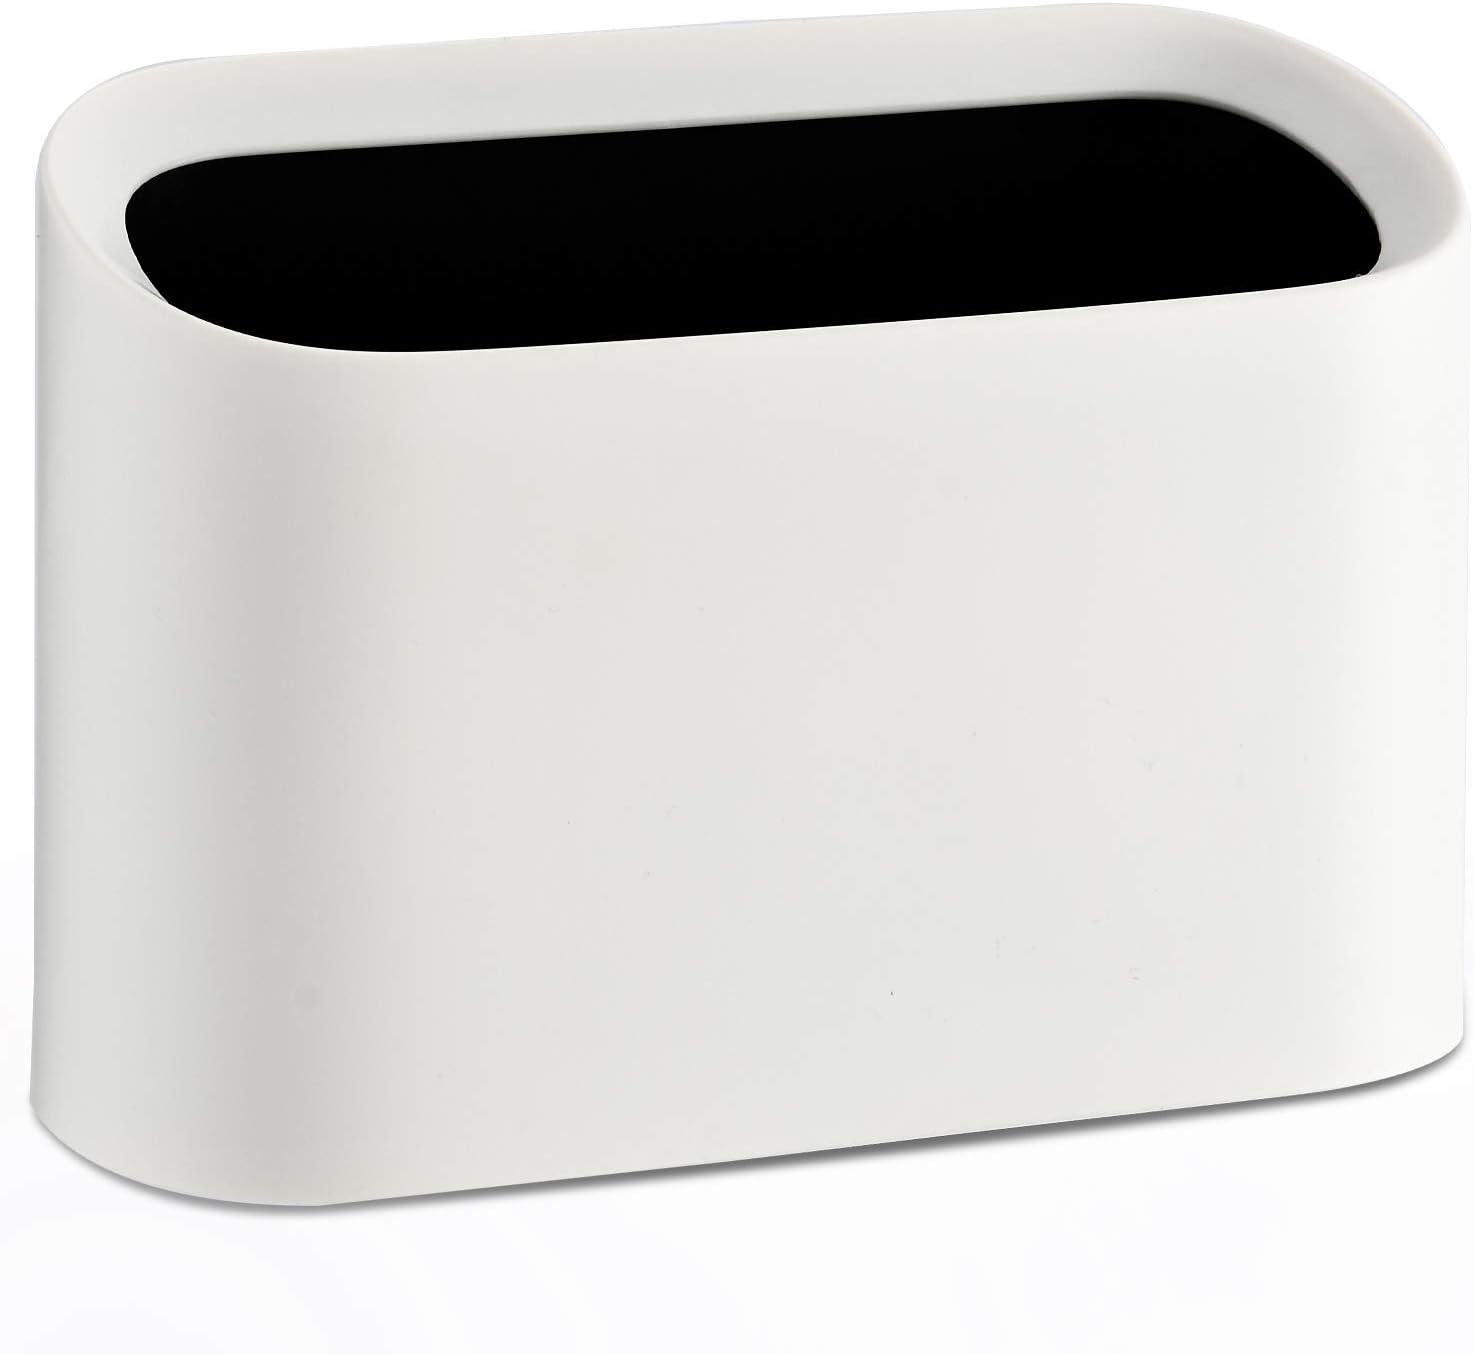 SUBEKYU Mini Desktop Wastebasket Trash Can, Plastic Small Tiny Office Countertop Garbage Can, White